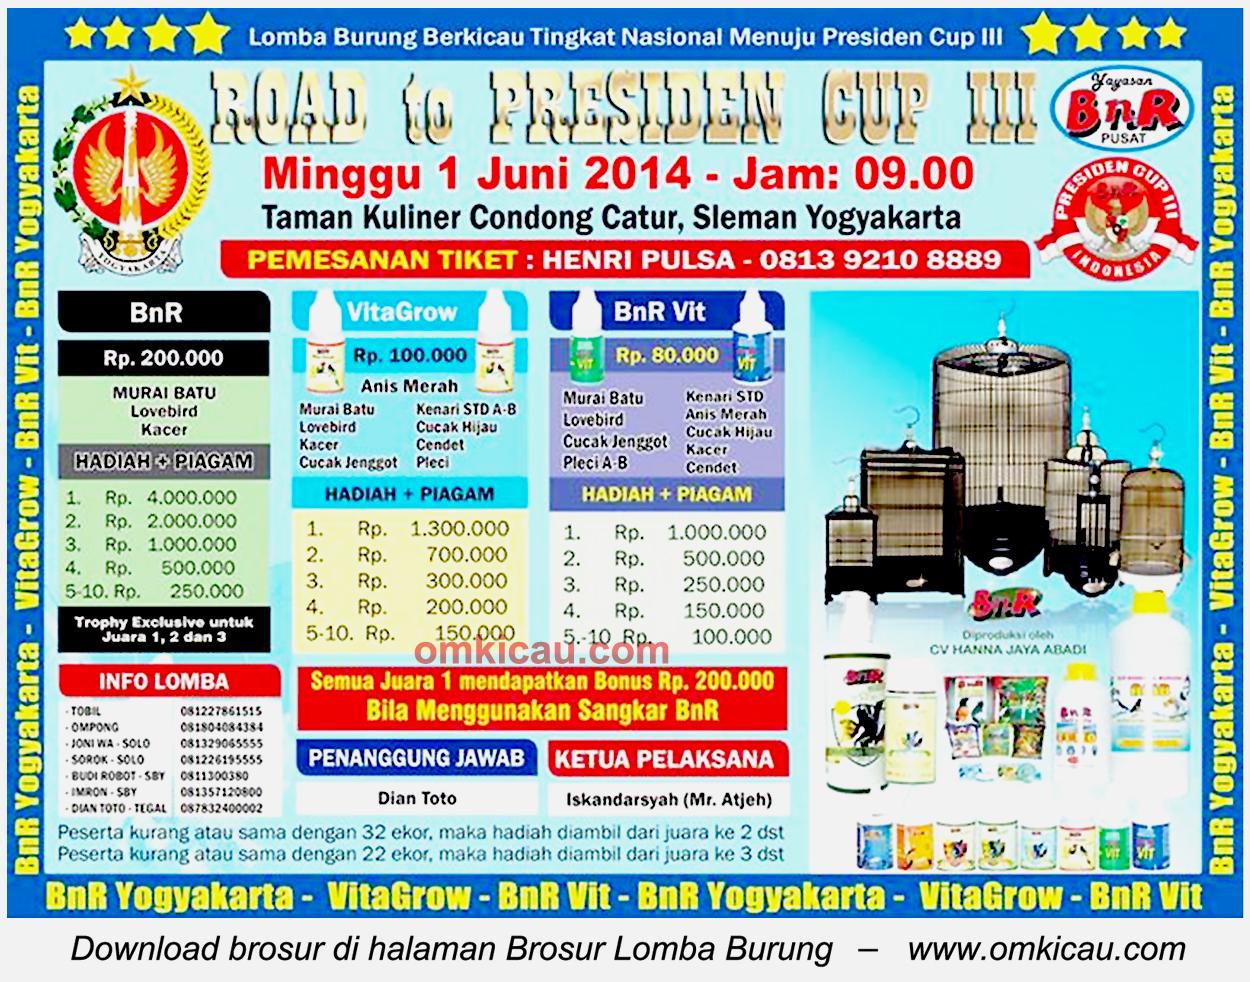 Brosur Lomba Burung Berkicau Road to Presiden Cup III, Jogja, 1 Juni 2014